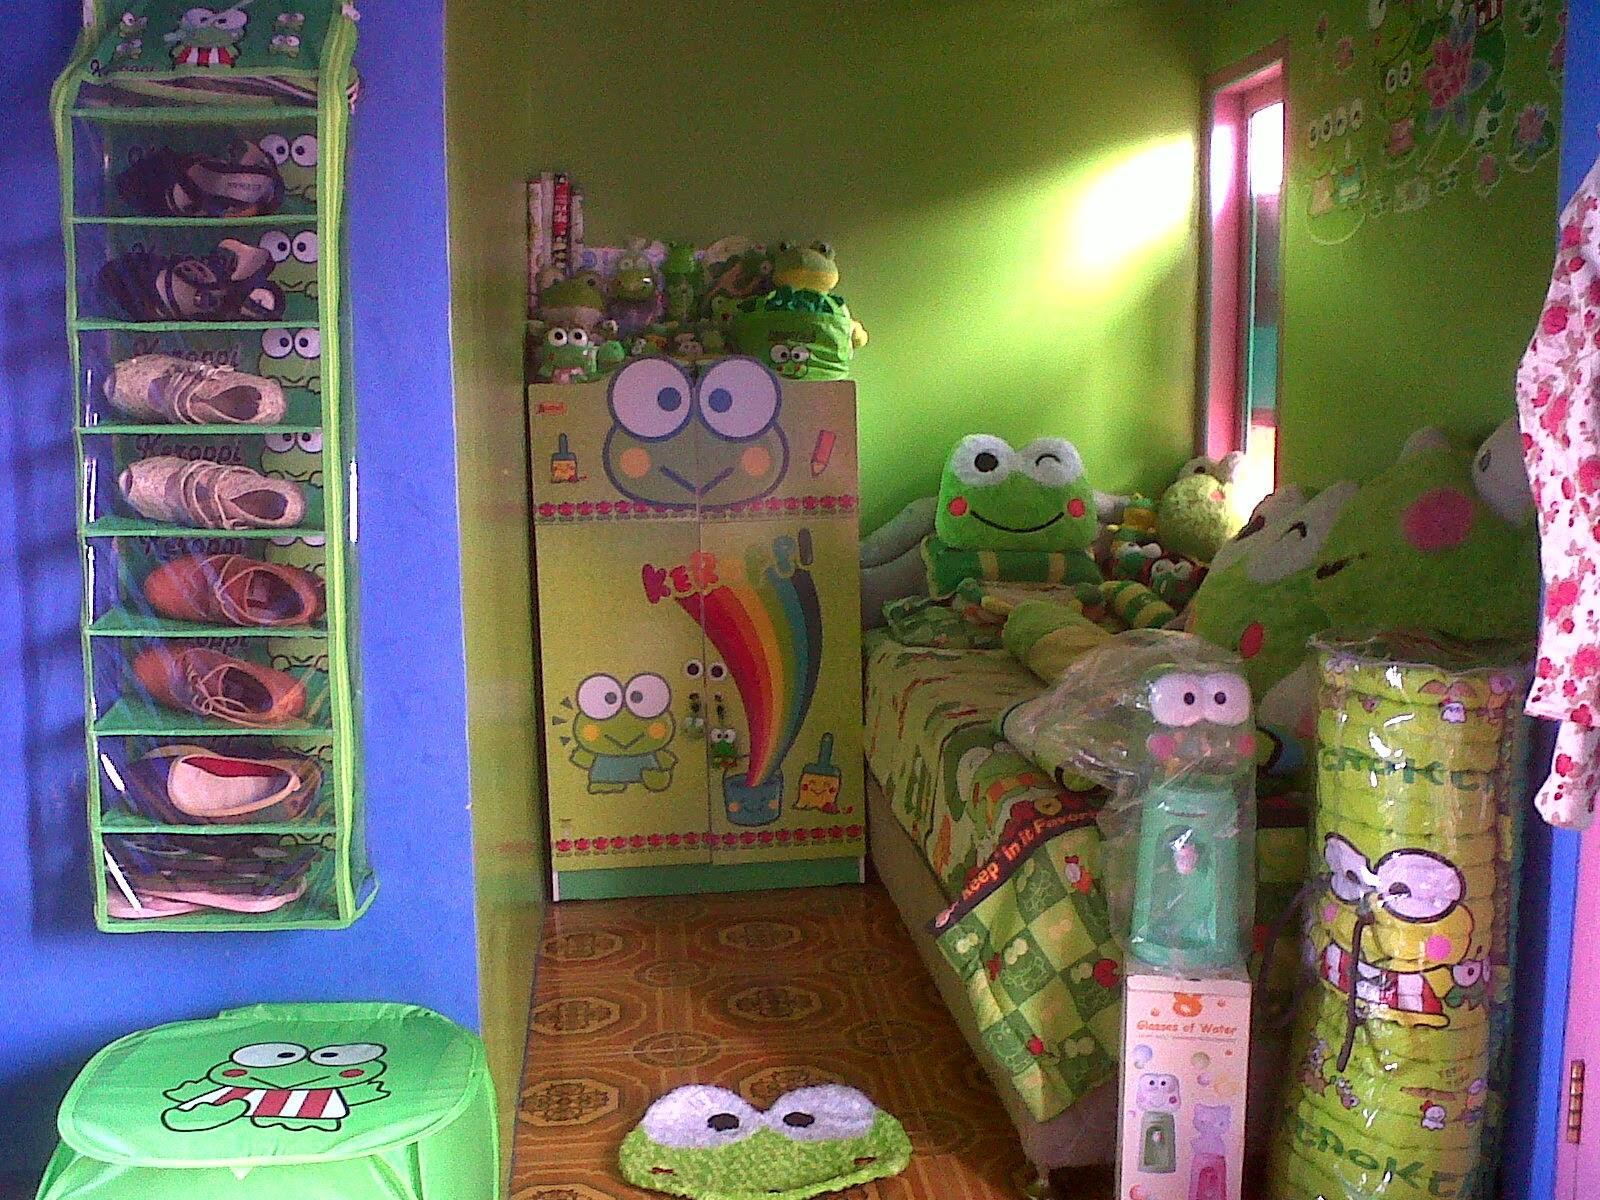 103 wallpaper dinding kamar keroppi | wallpaper dinding